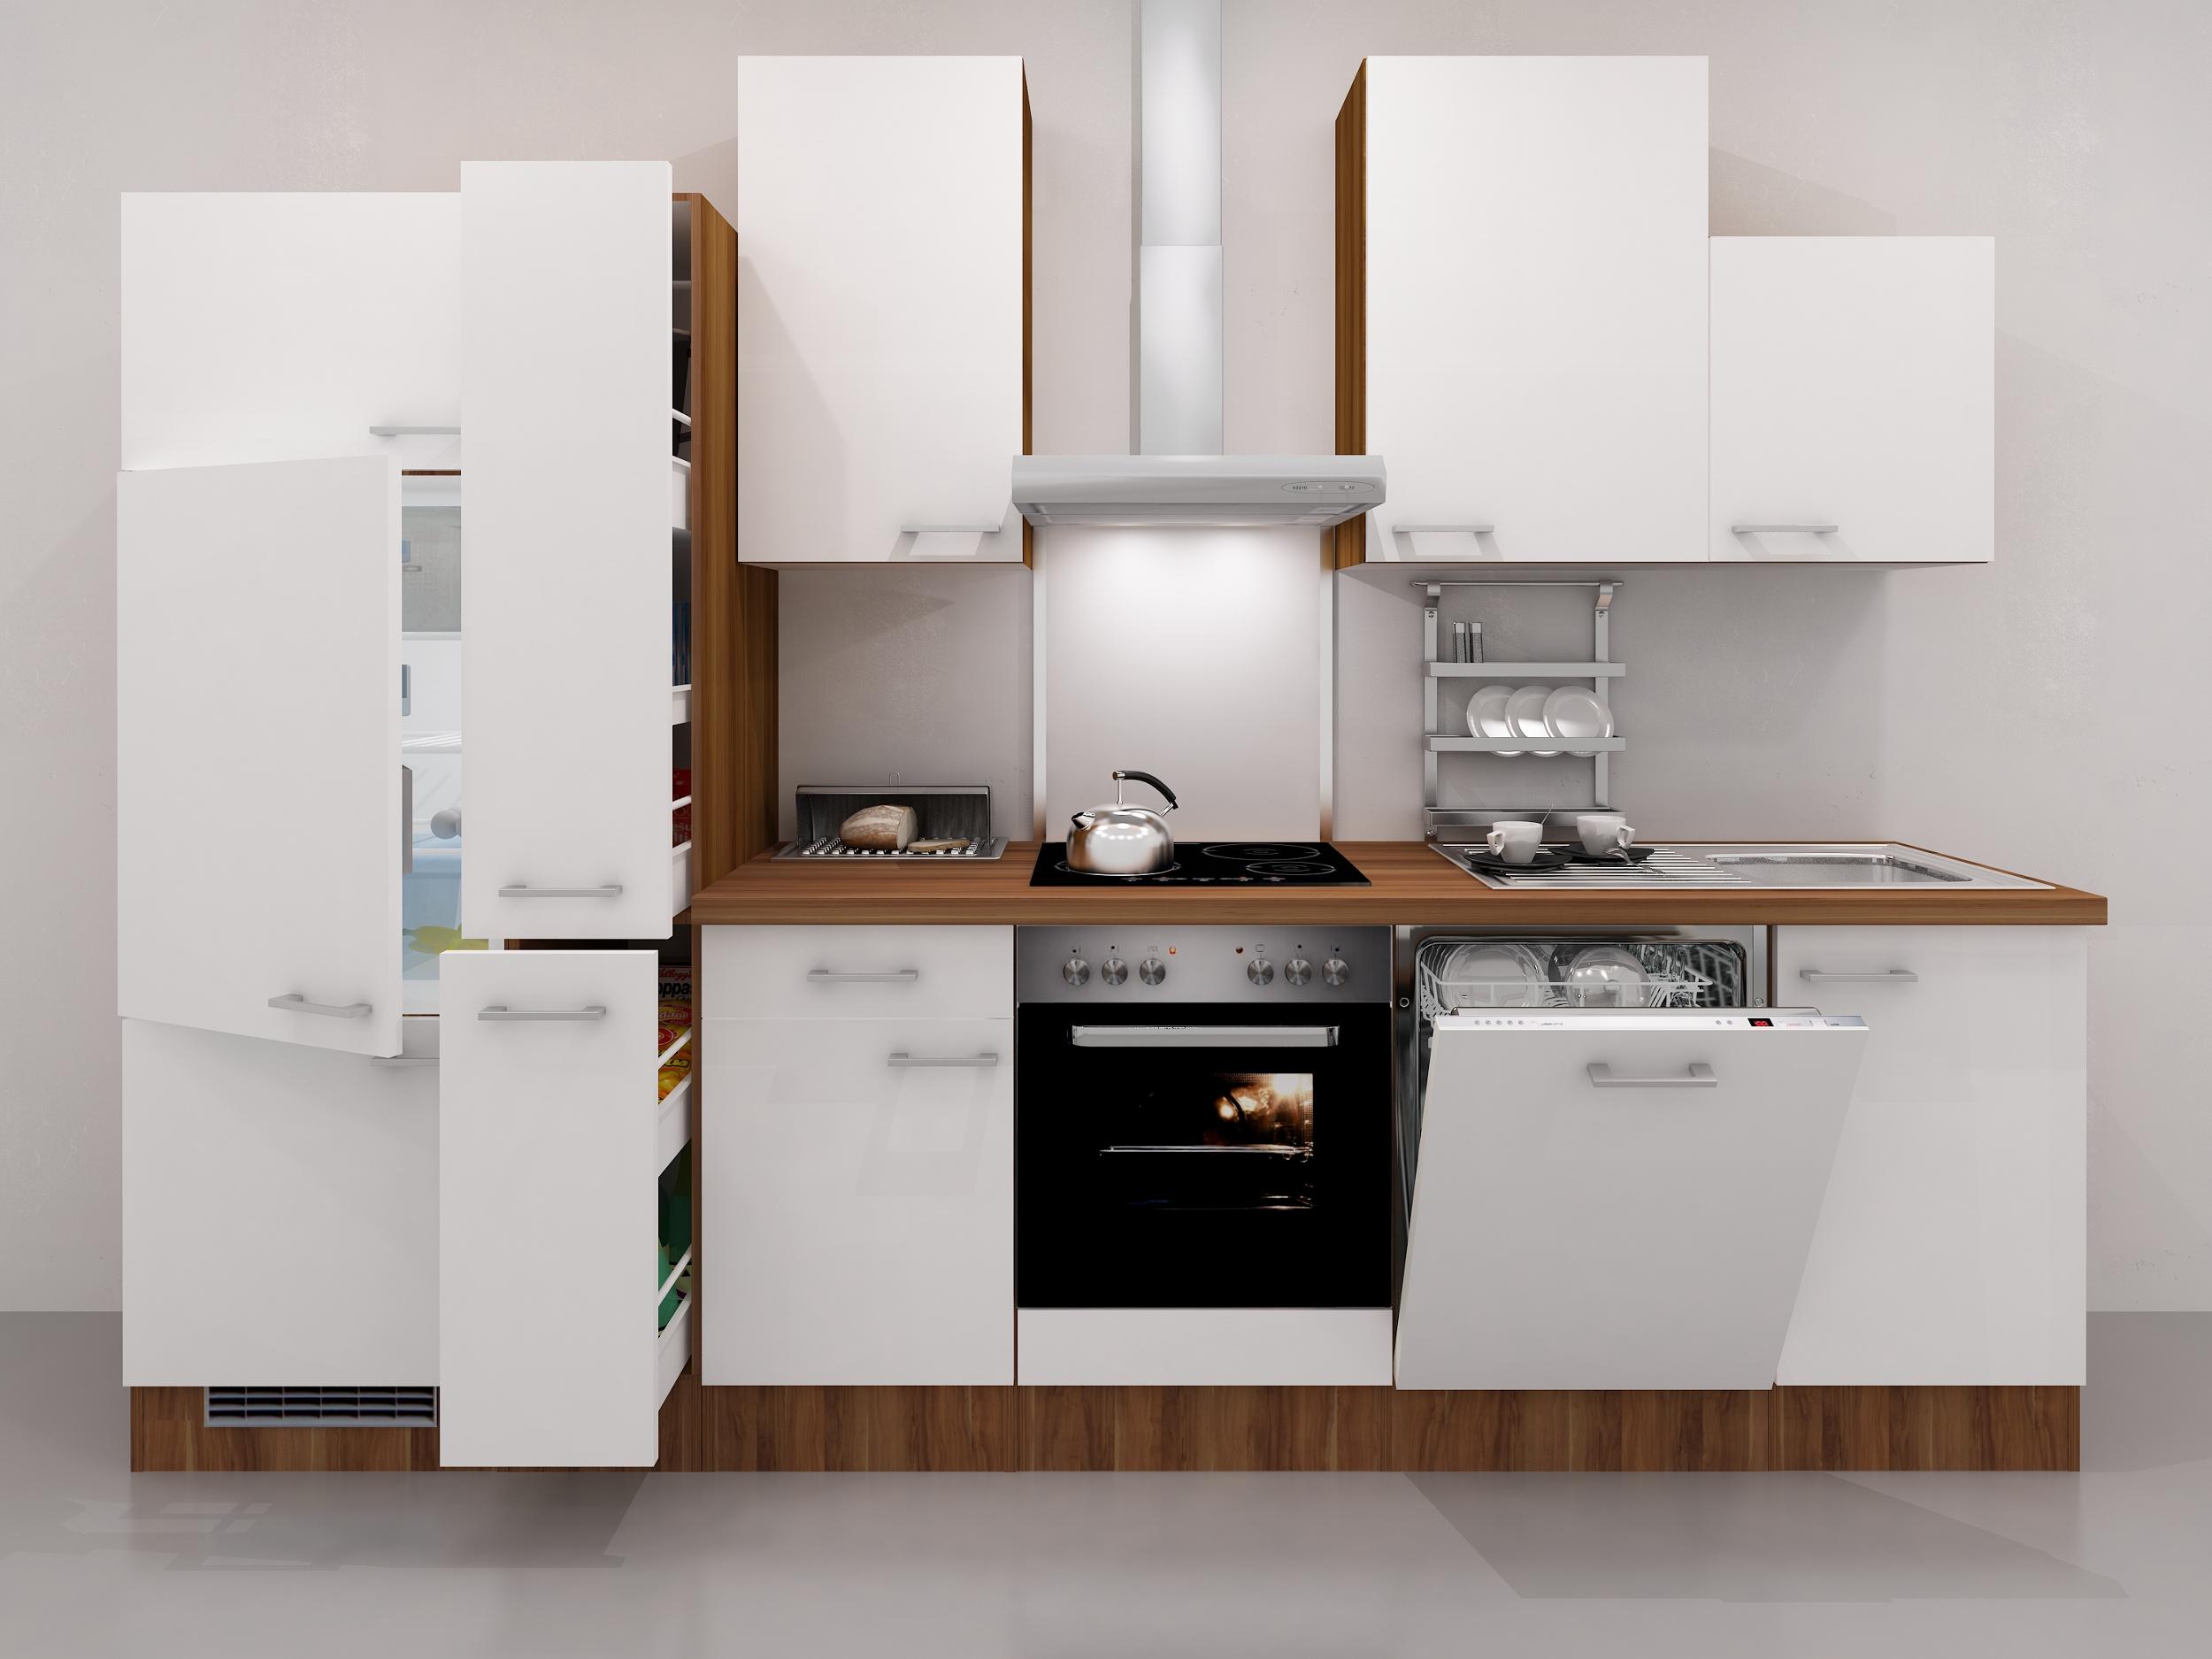 k chen apothekerschrank cosmo 2 front ausz ge 5 k rbe perlmutt wei k che k chen. Black Bedroom Furniture Sets. Home Design Ideas